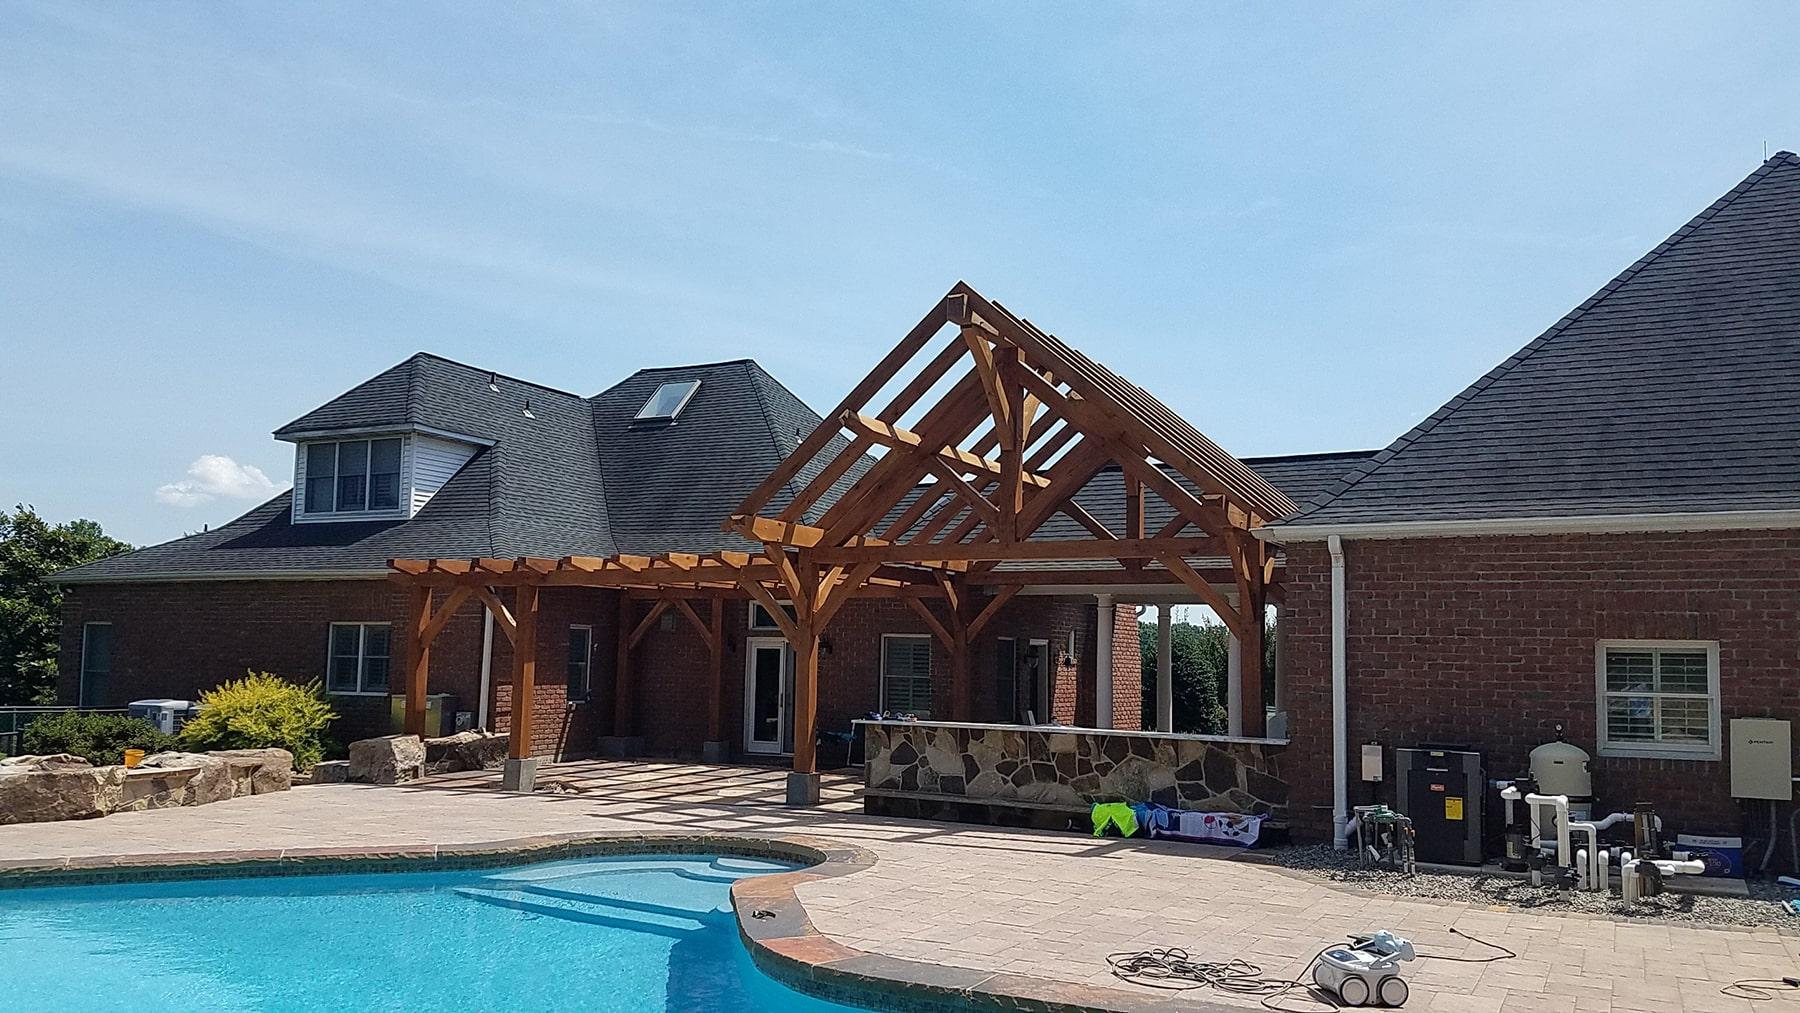 Luxury pool design in Carrol County, MD